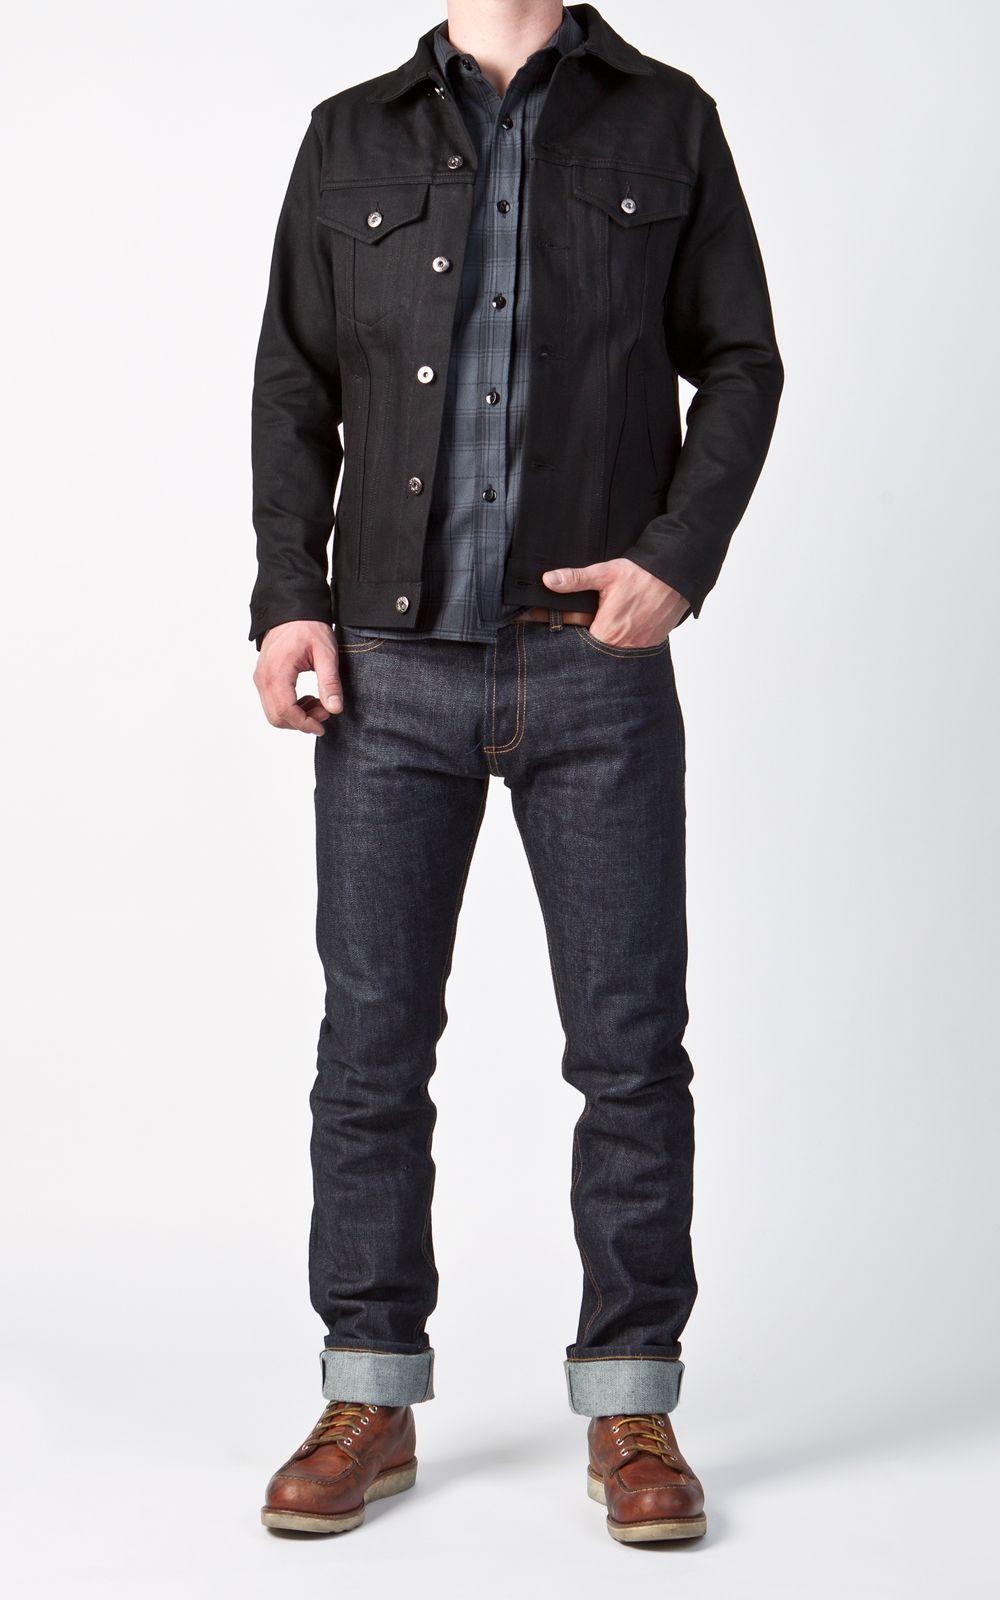 3sixteen Type 3s Trucker Denim Jacket Double Black Selvage Denim Fashion Men Fashion Casual Outfits Denim Jacket Men [ 1600 x 1000 Pixel ]